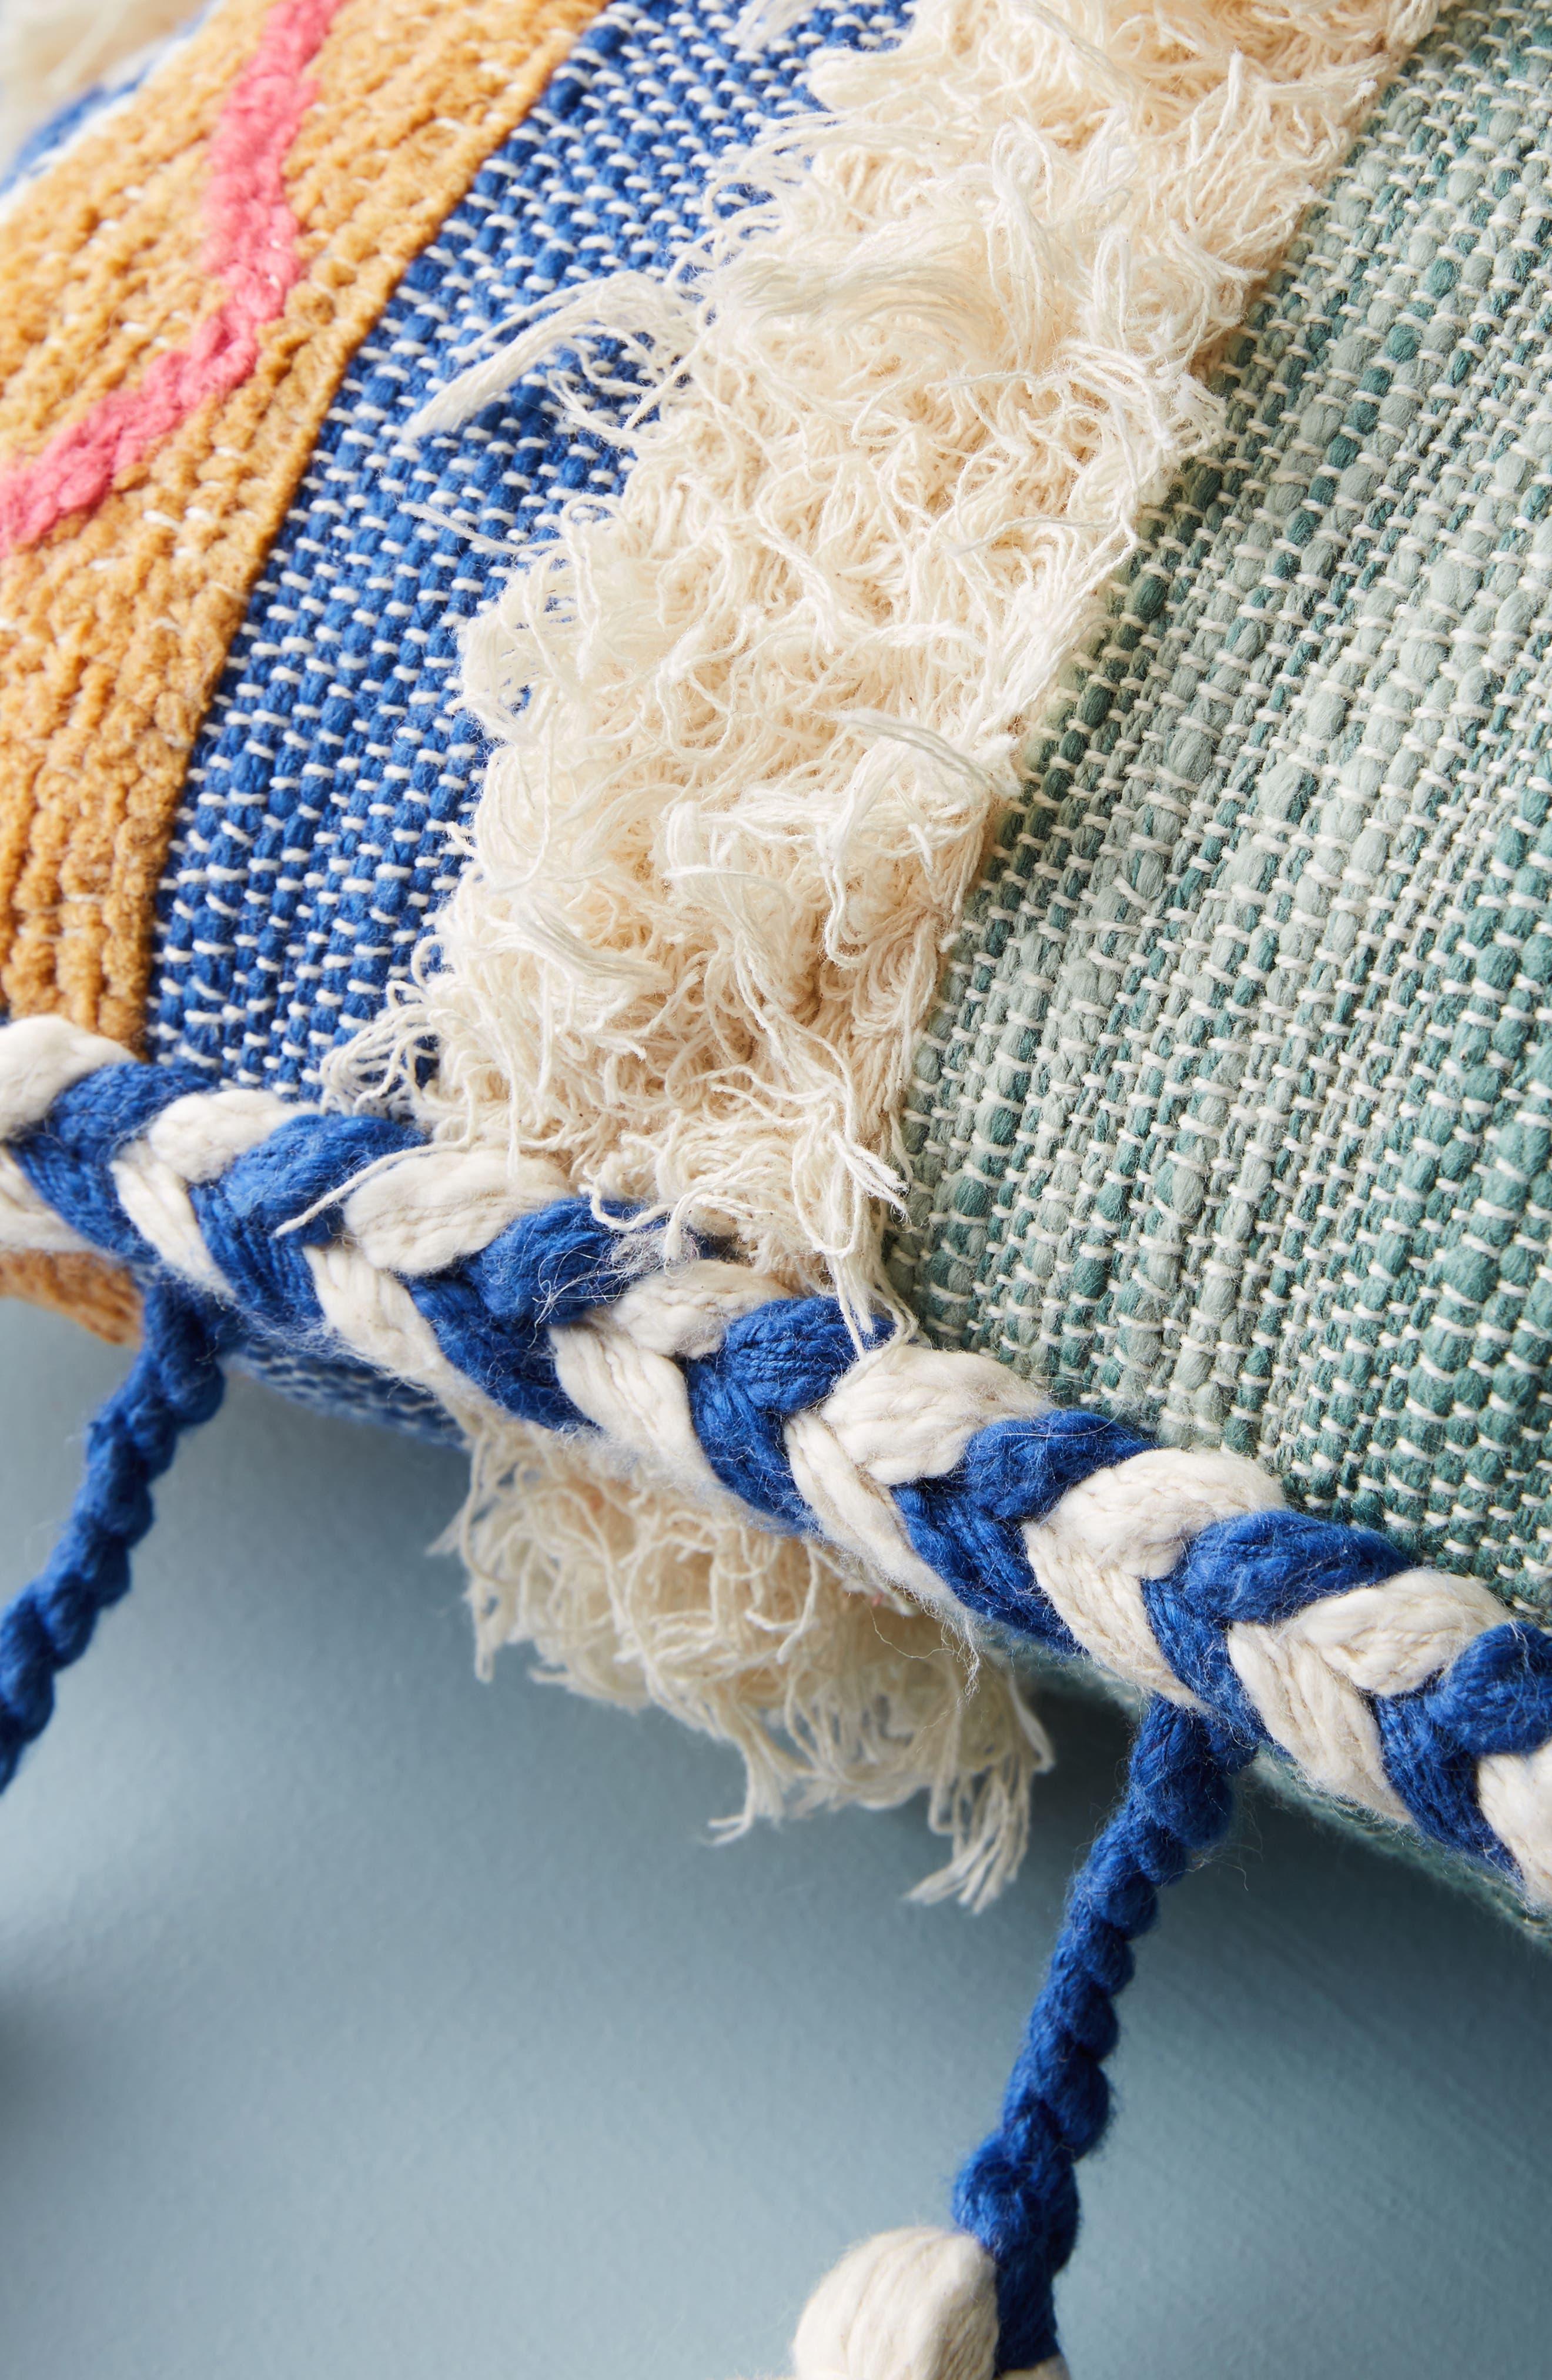 Woven Rami Accent Pillow,                             Alternate thumbnail 3, color,                             Blue Combo